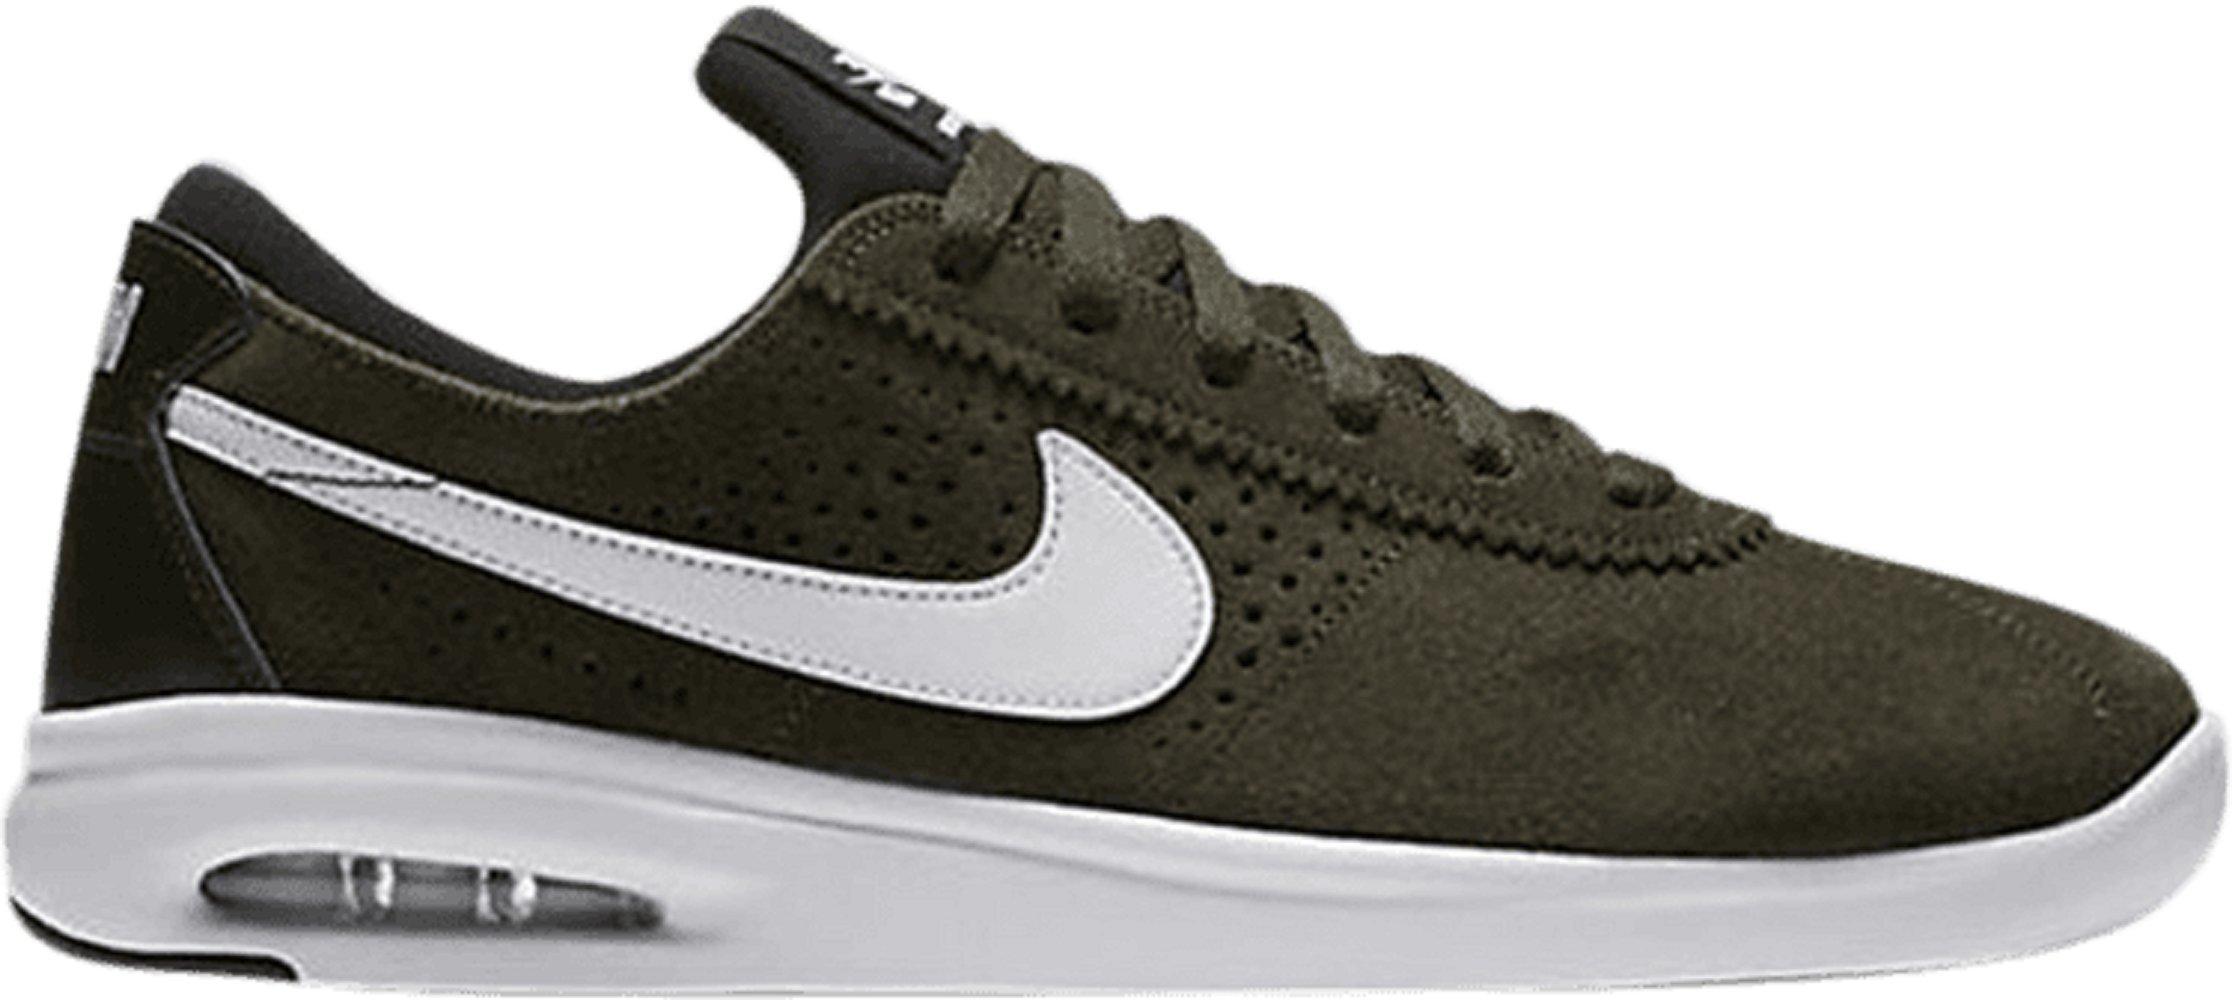 Nike SB AIR MAX Bruin VPR TXT Mens Skateboarding Shoes AA4257 700_9.5 Yellow OchreObsidian RED Crush White